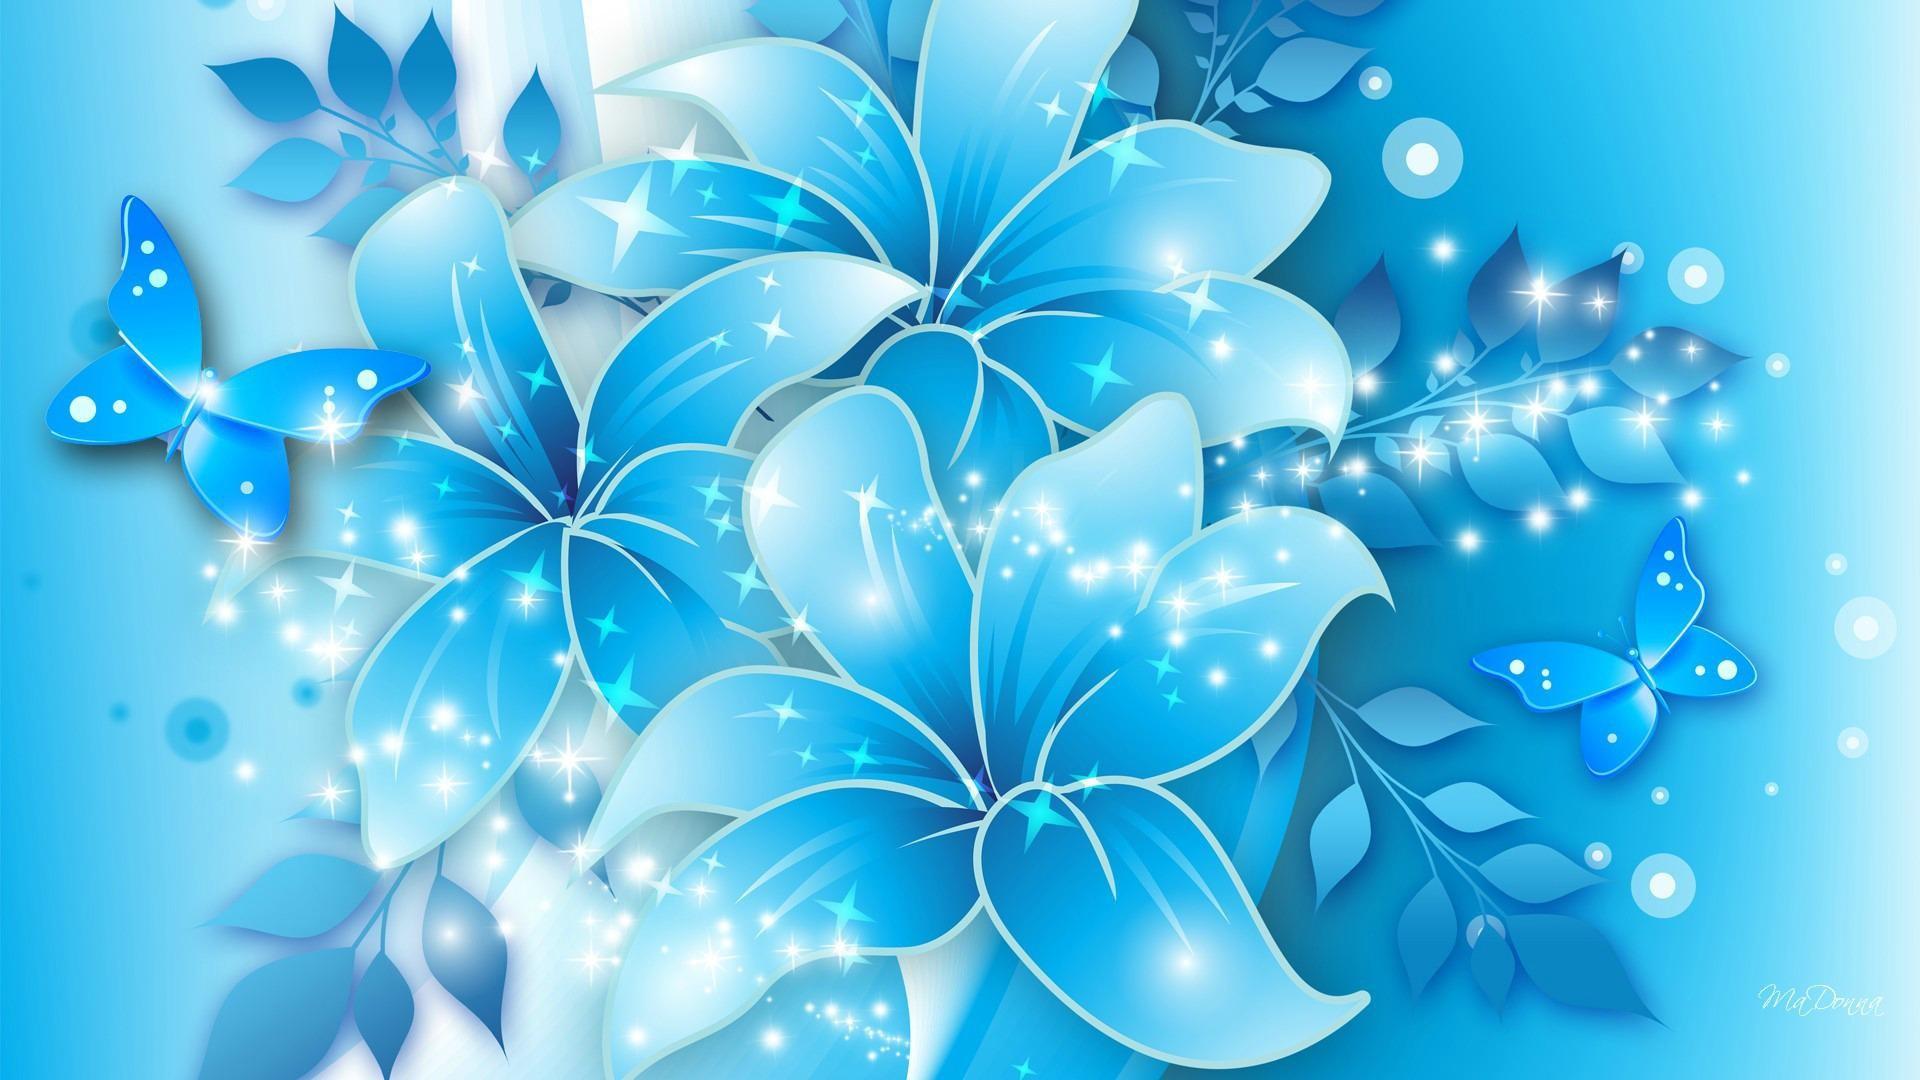 Blue flower wallpaper 61 images 1920x1080 blue flower wallpaper high resolution izmirmasajfo